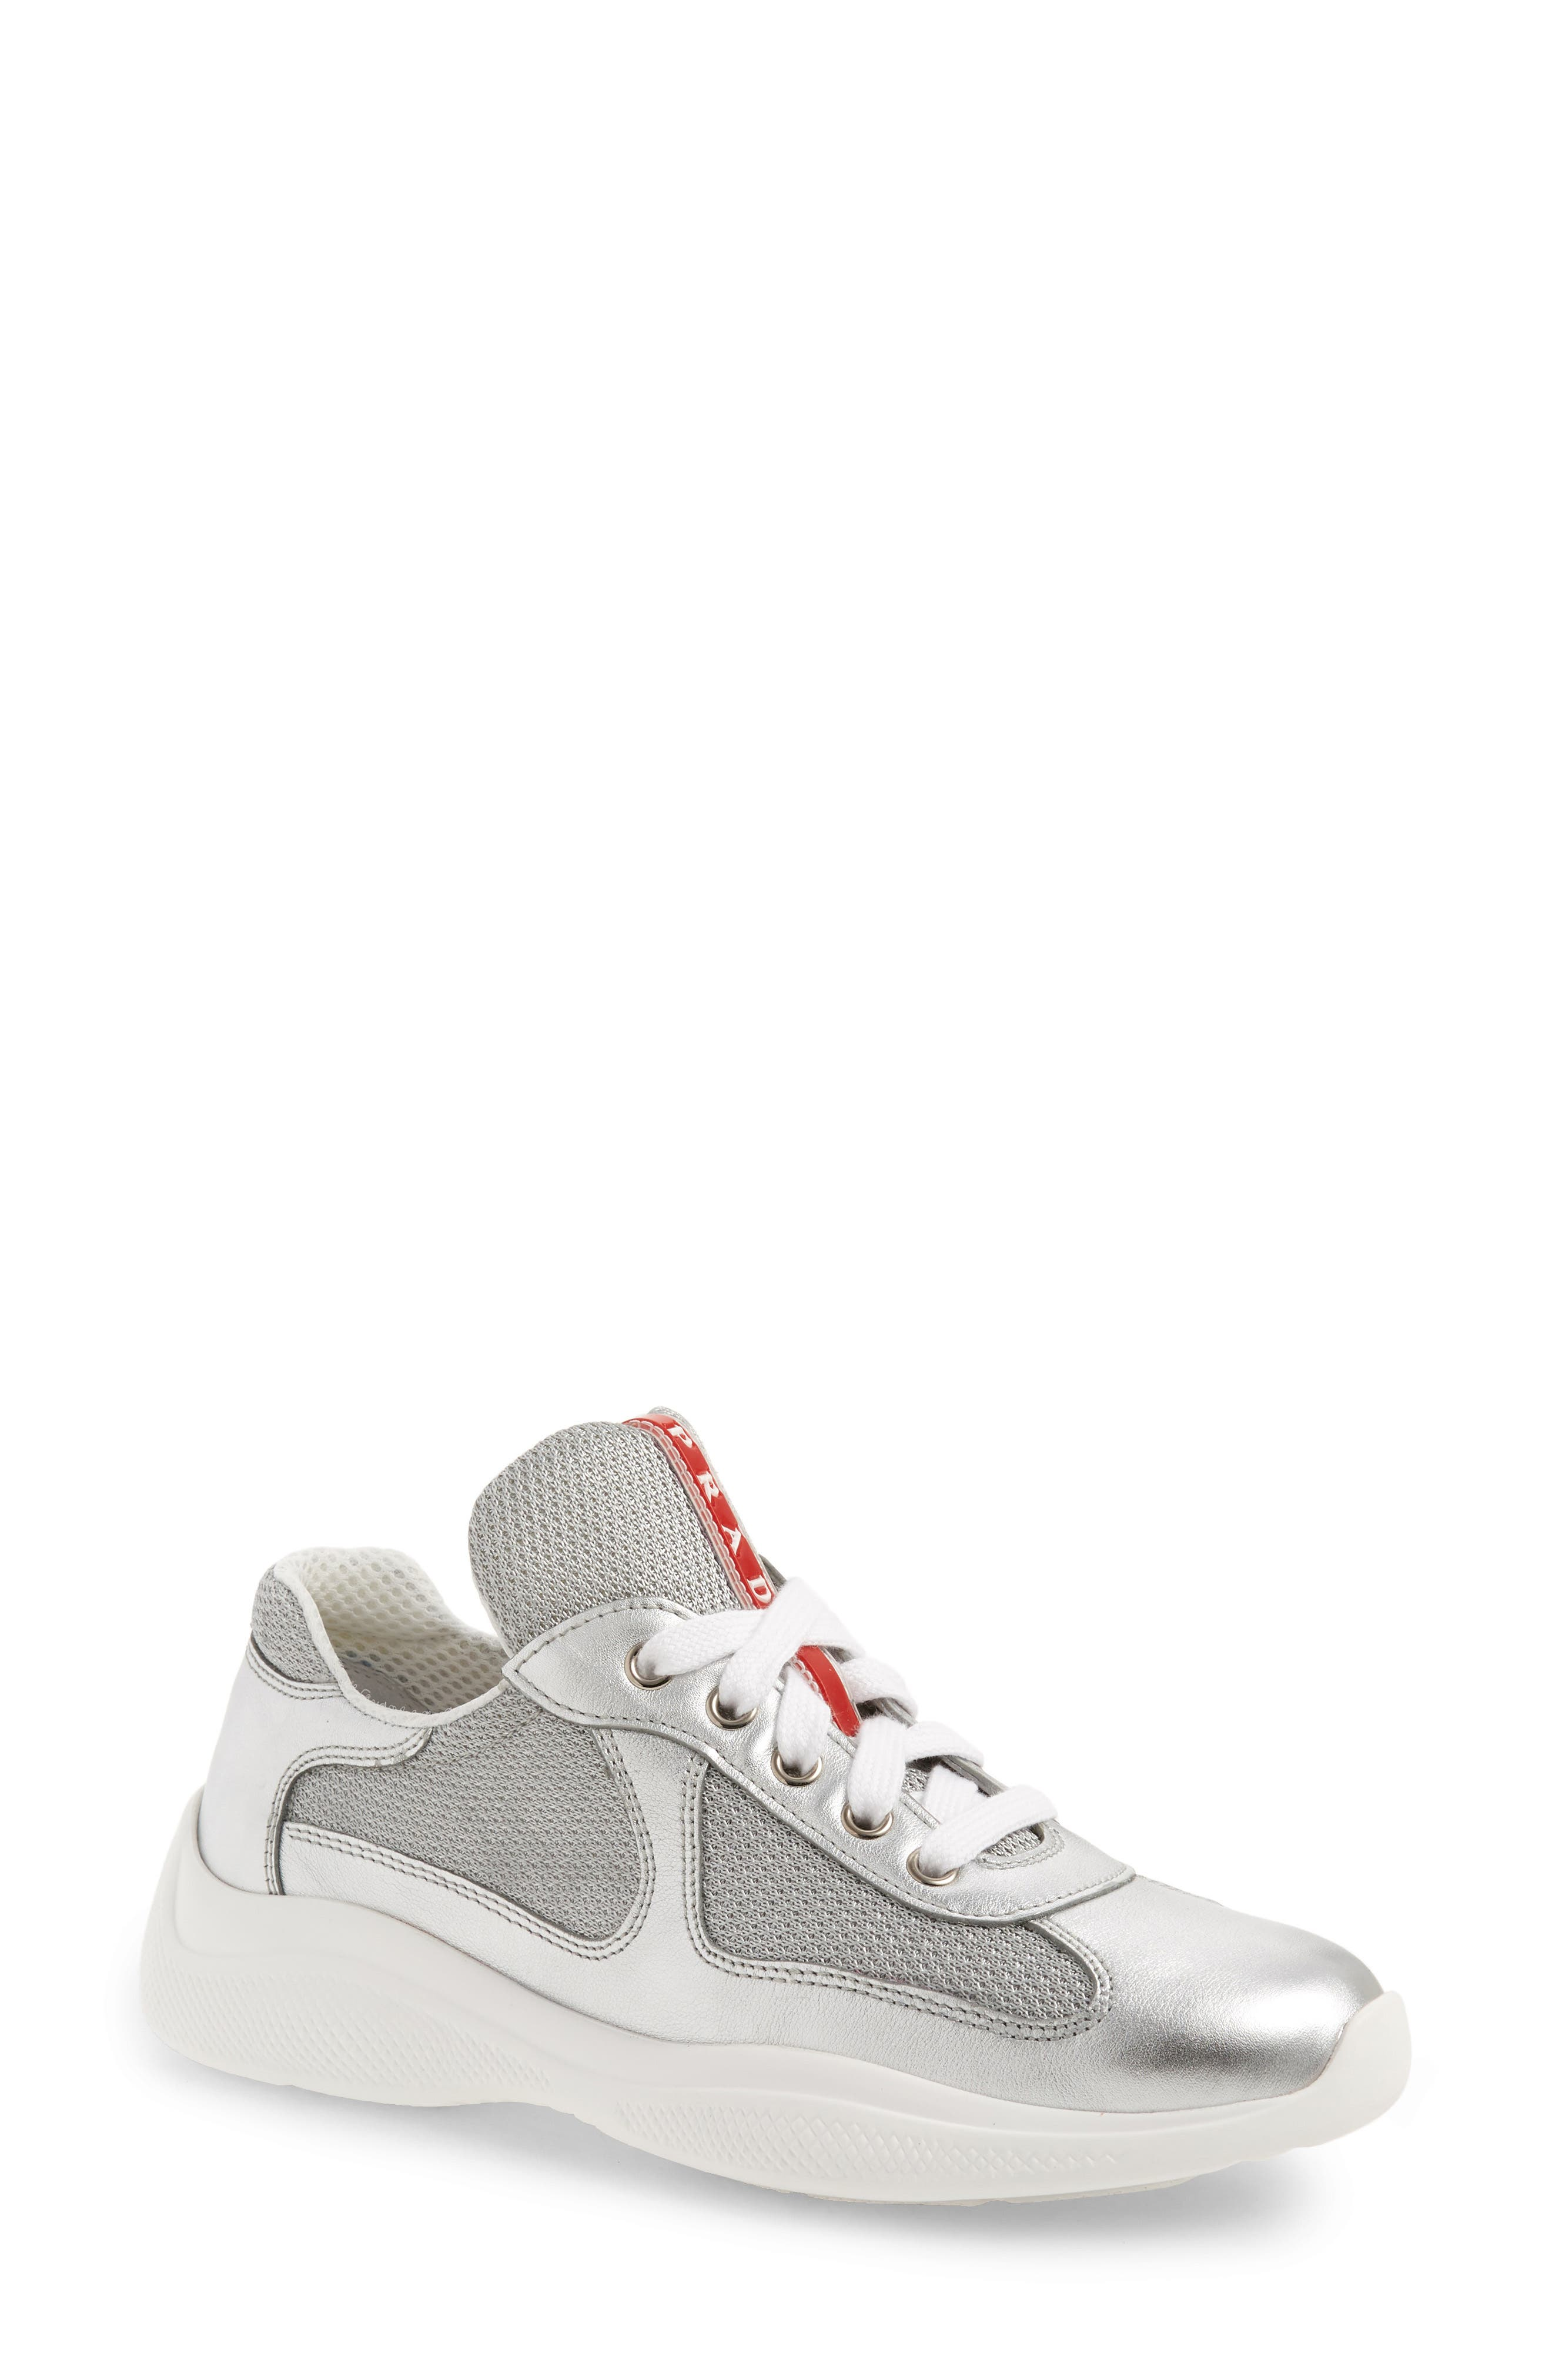 Low-Top Sneaker,                         Main,                         color, METALLIC SILVER